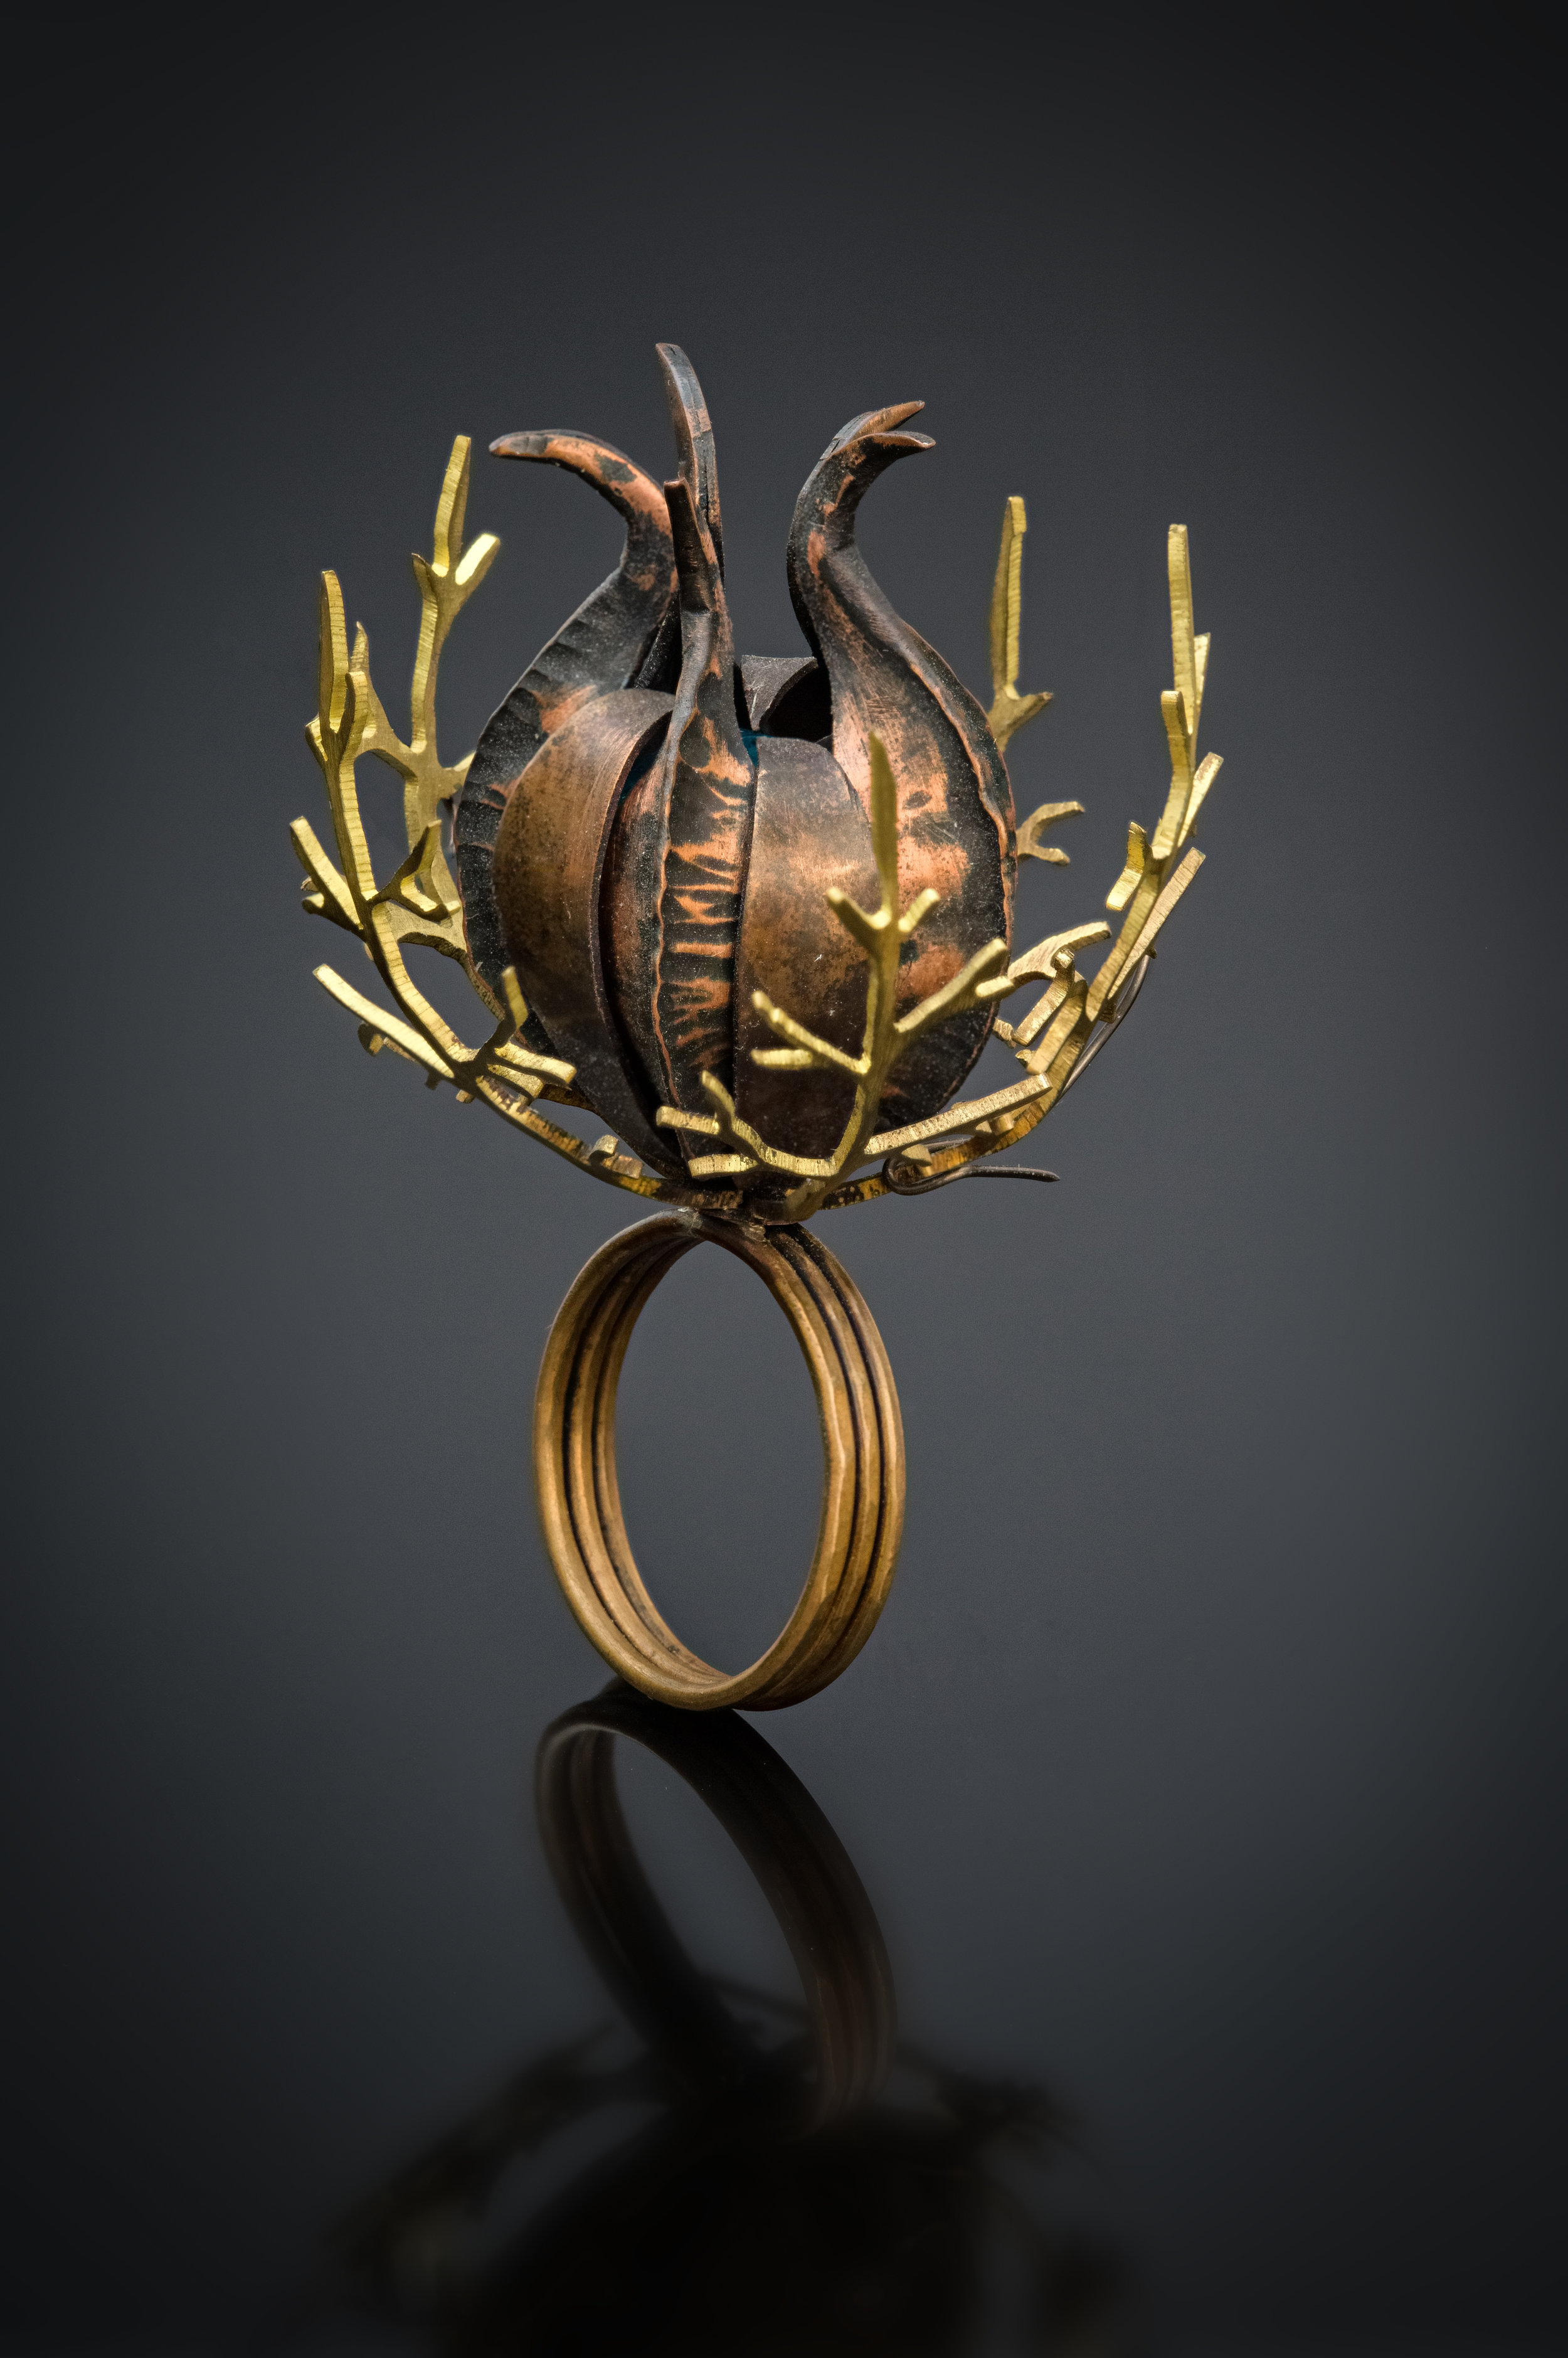 Titania's Wedding Ring